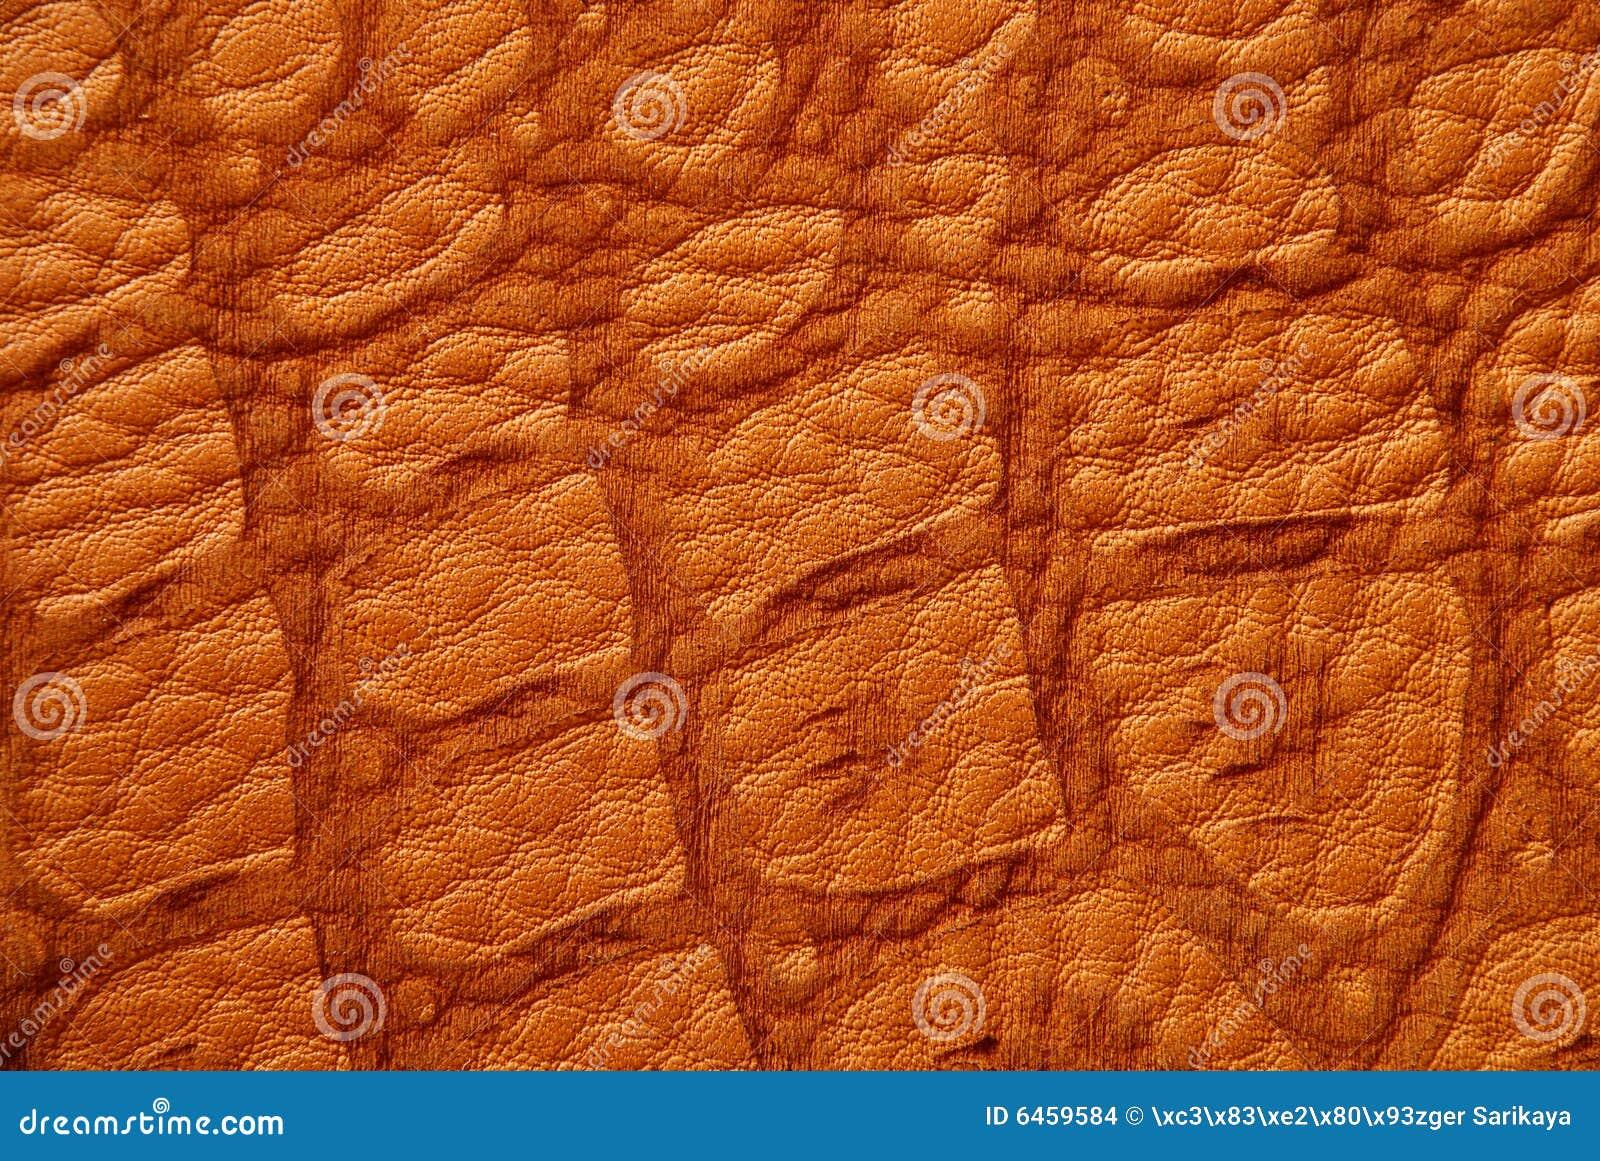 Skóra krokodyla textured